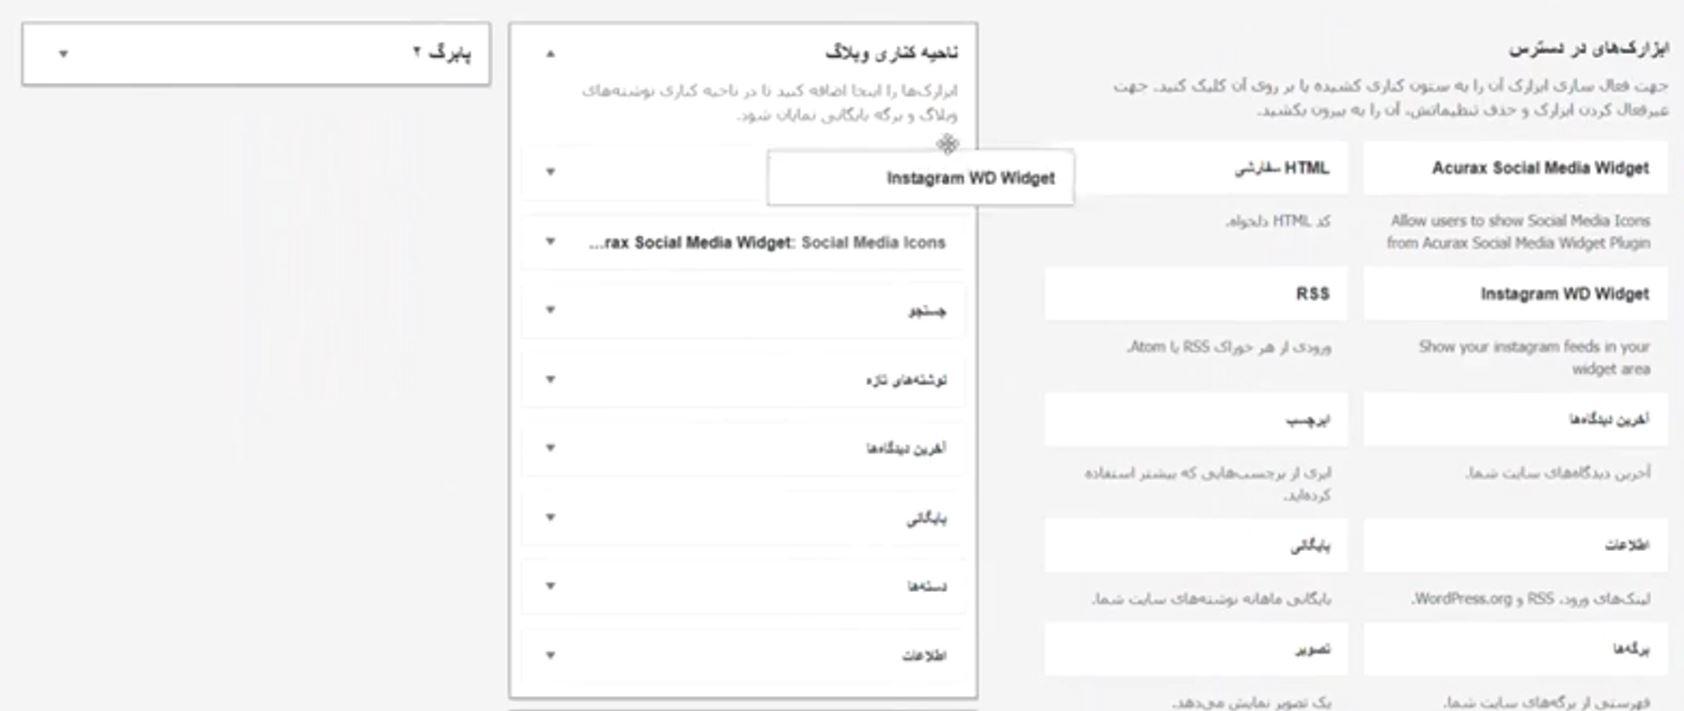 Web Social Photo Feed widget